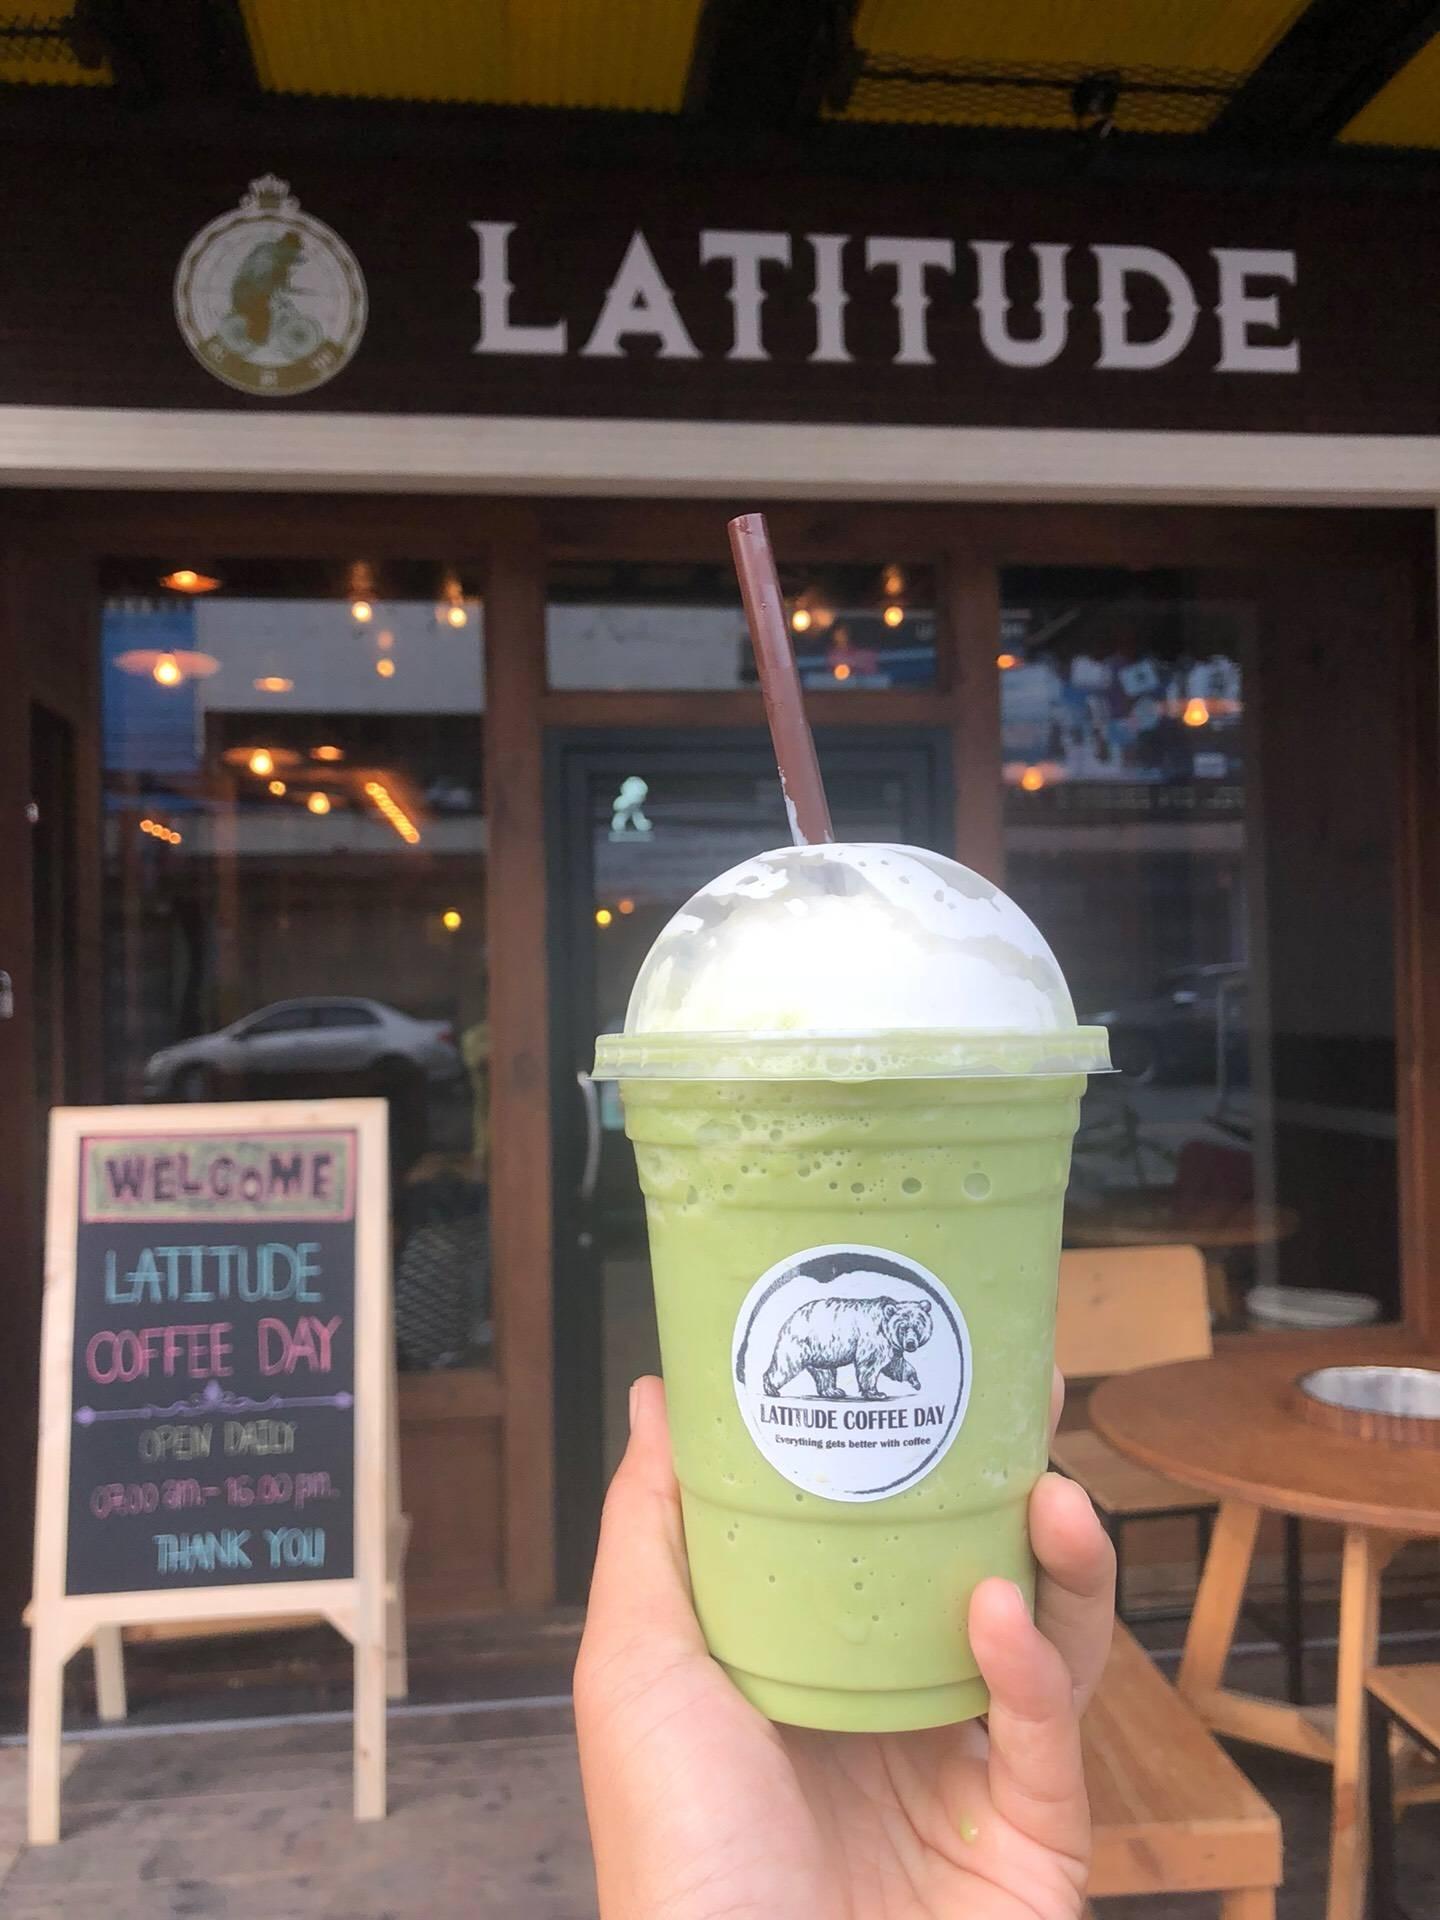 Latitude Coffee Day